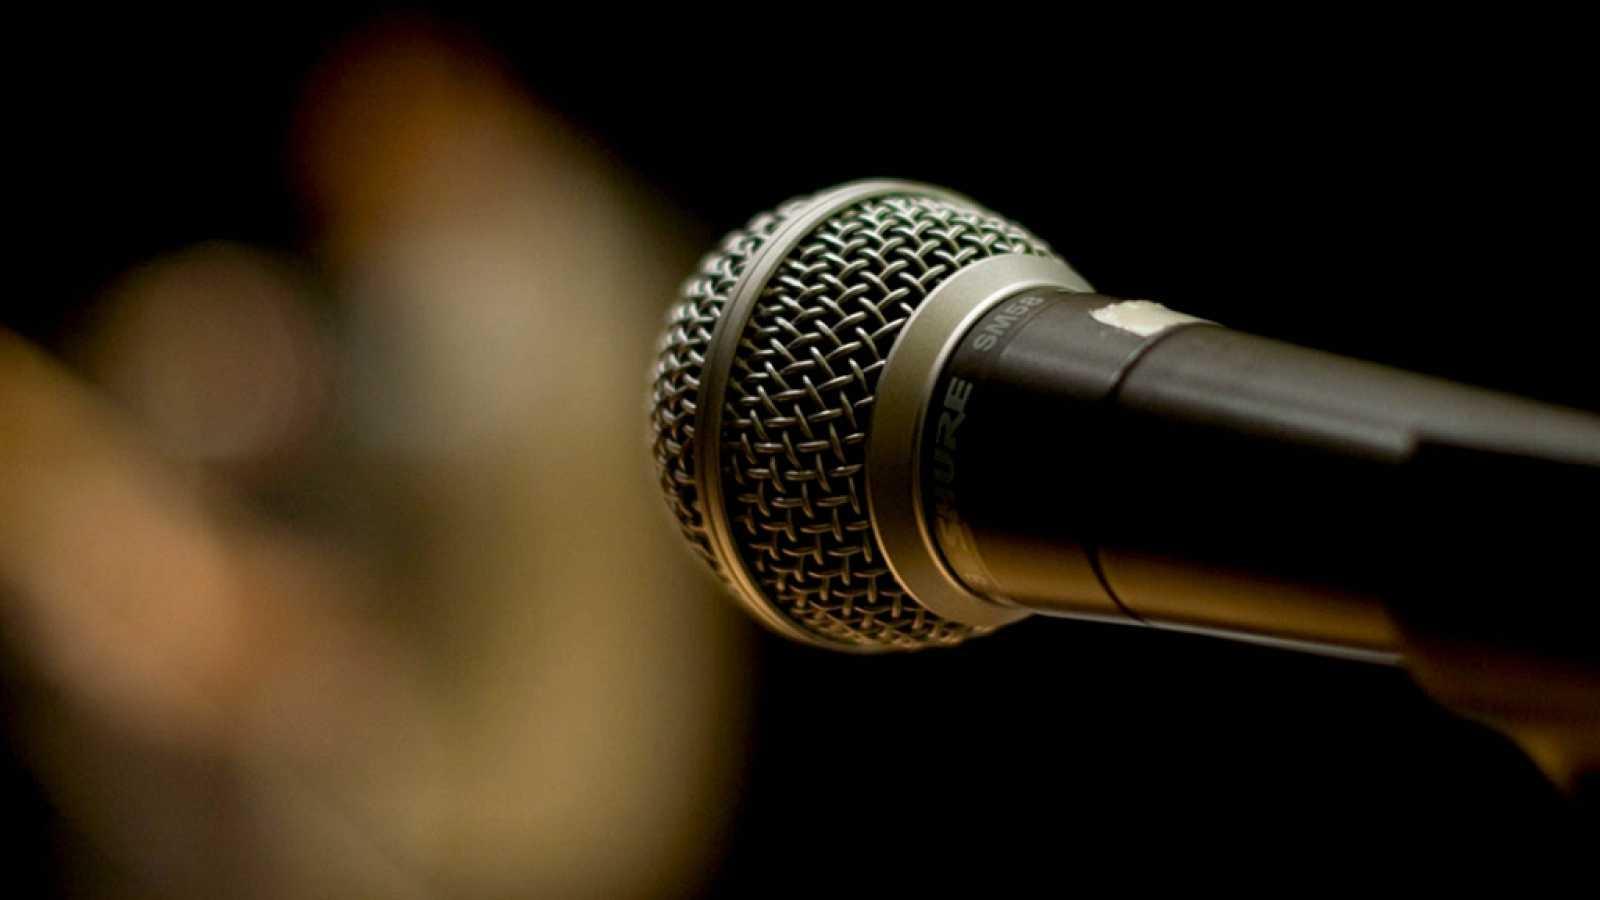 Todo a capella - Voces de la naturaleza - 18/08/19 - escuchar ahora